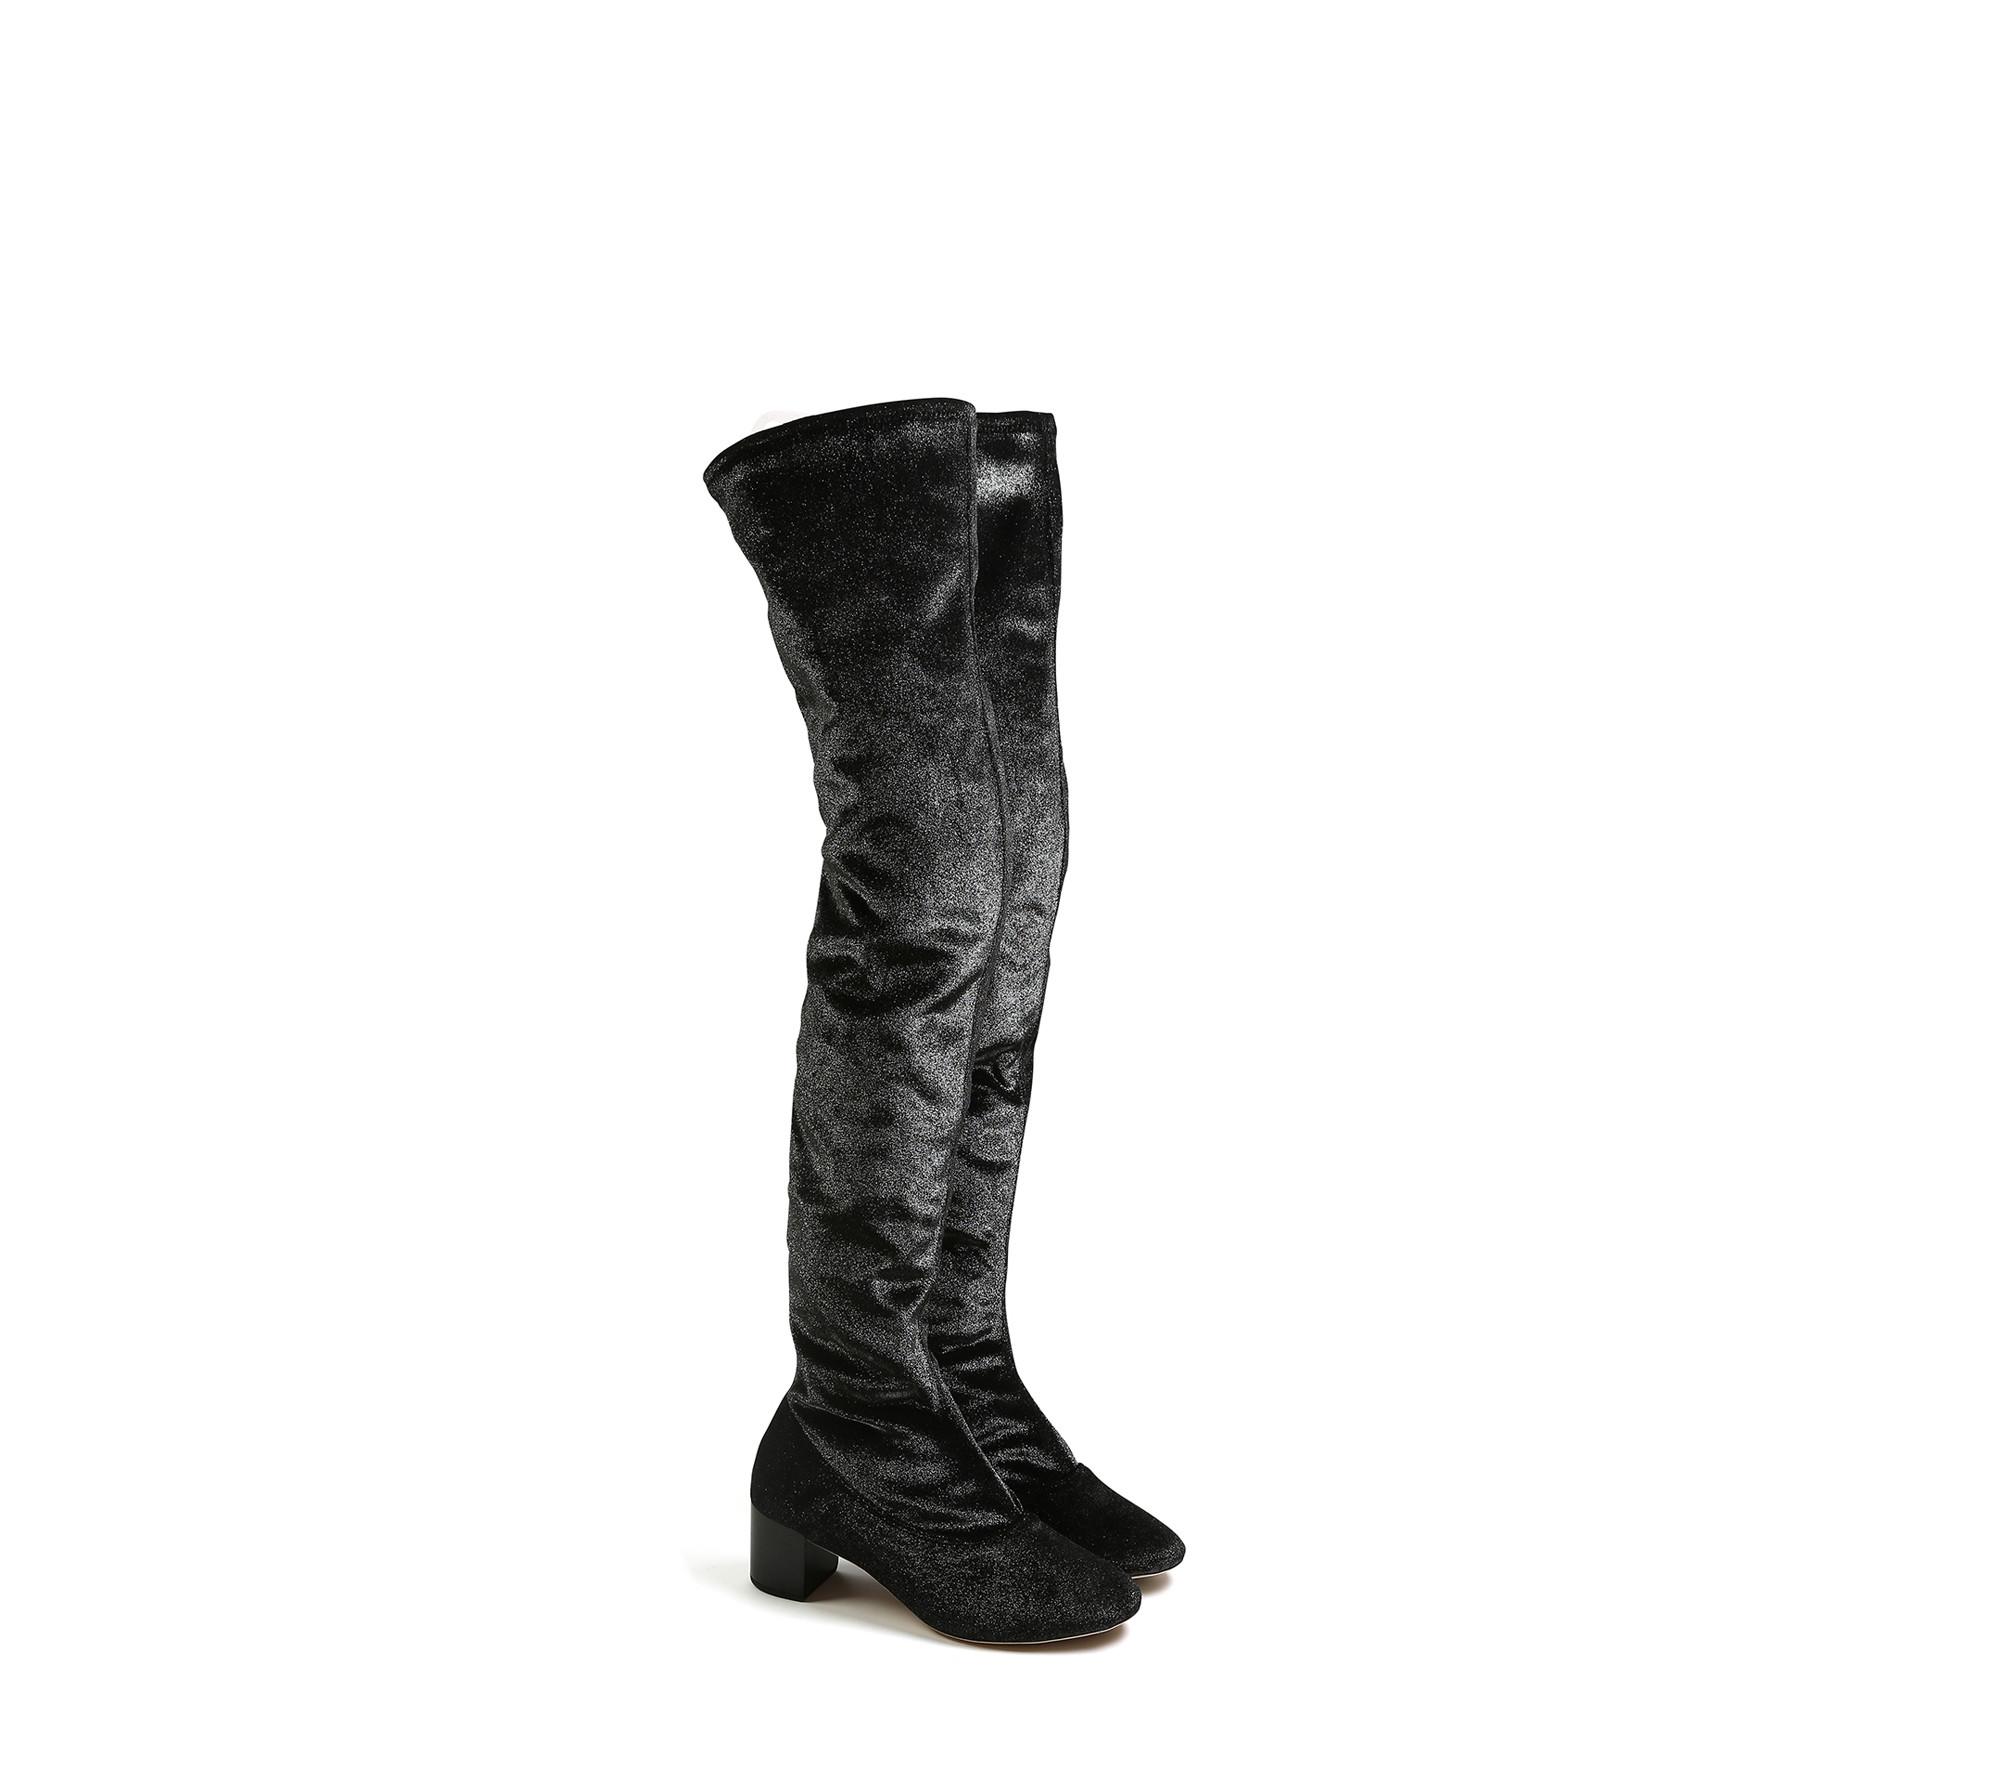 Jambette thigh boots